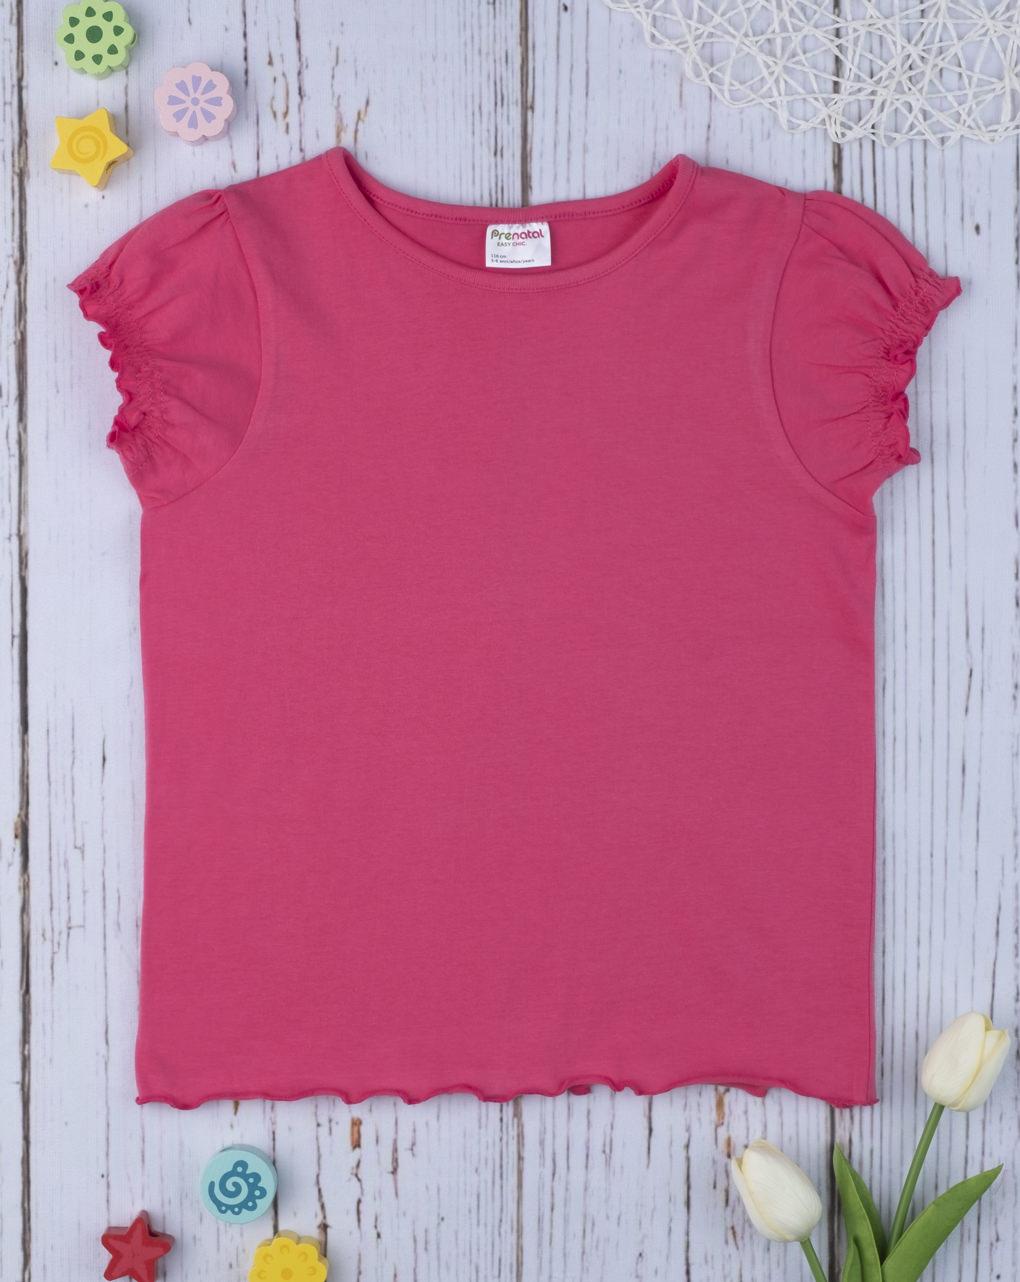 T-shirt girl total pink - Prénatal